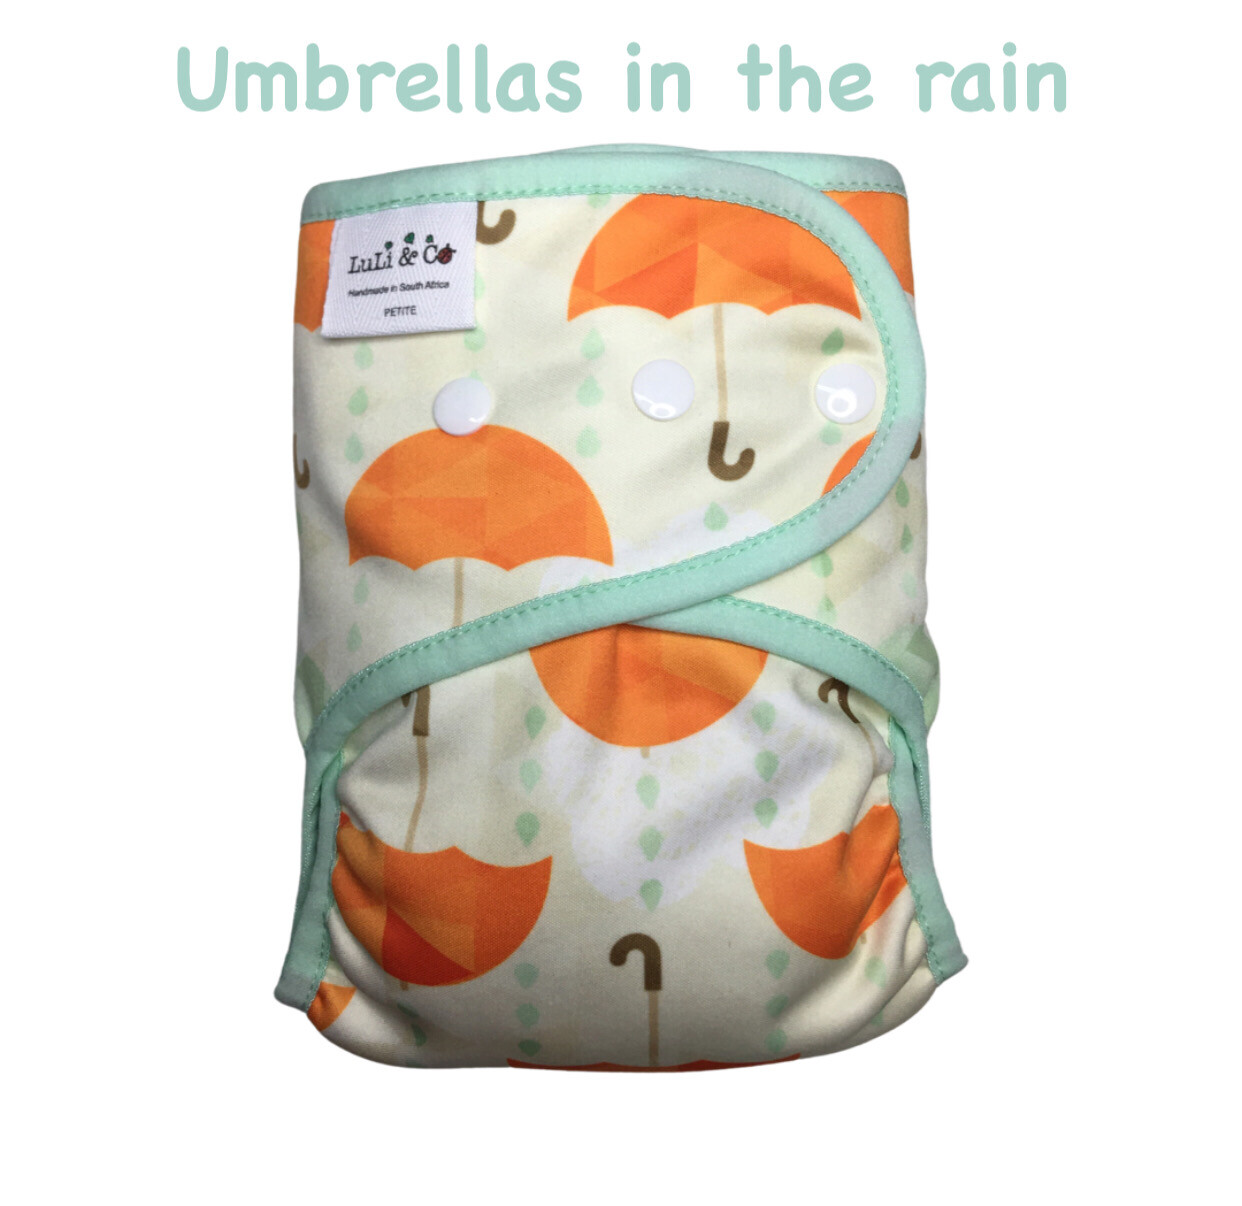 SOFTSHELL COVER - UMBRELLAS IN THE RAIN